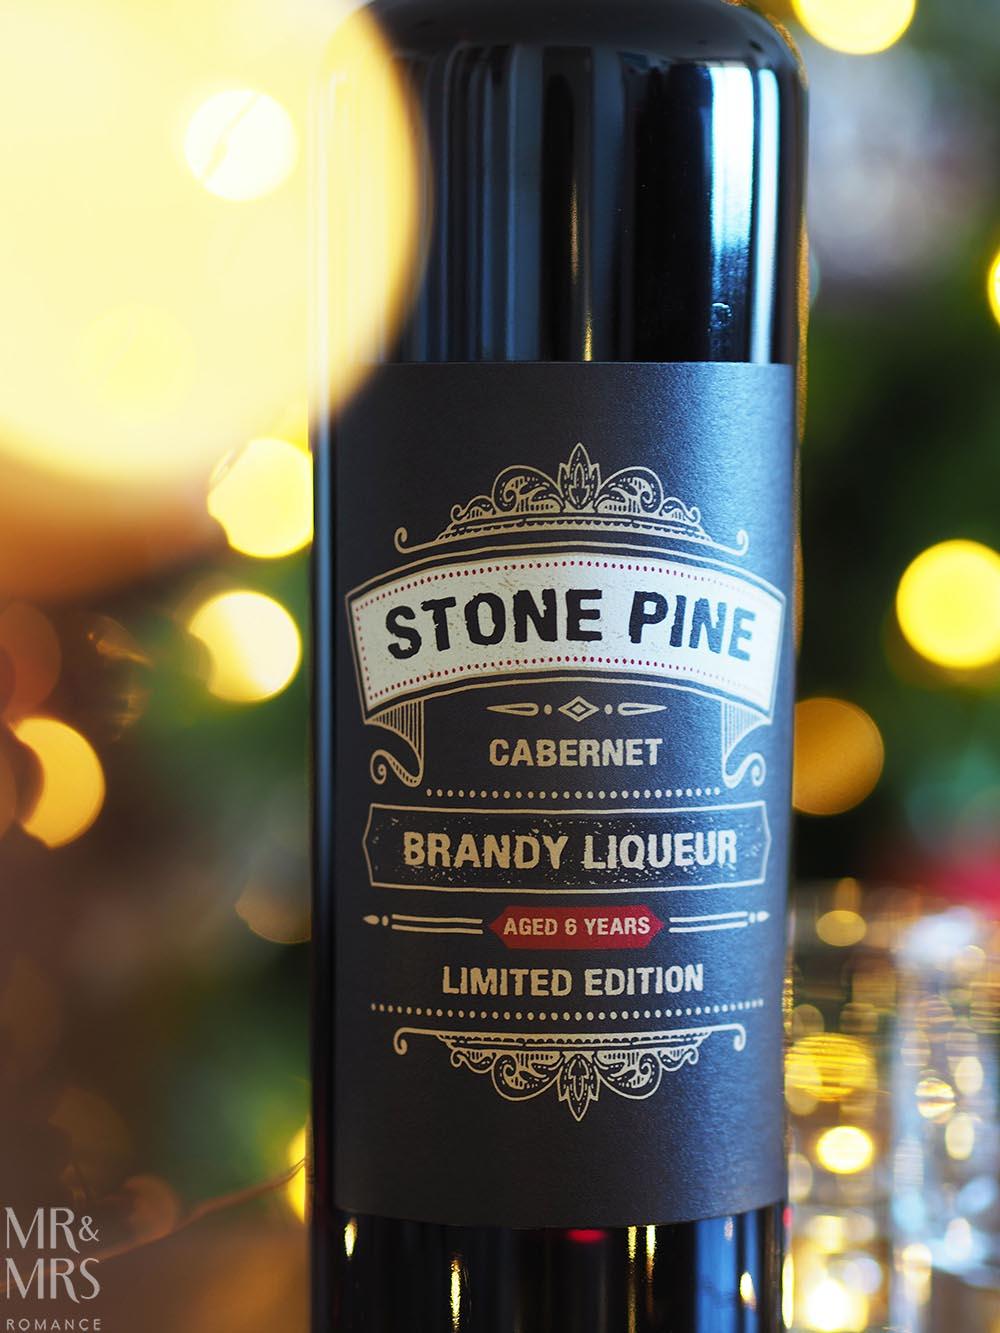 Last-minute Christmas gifts - Stone Pine Brandy Liqueur